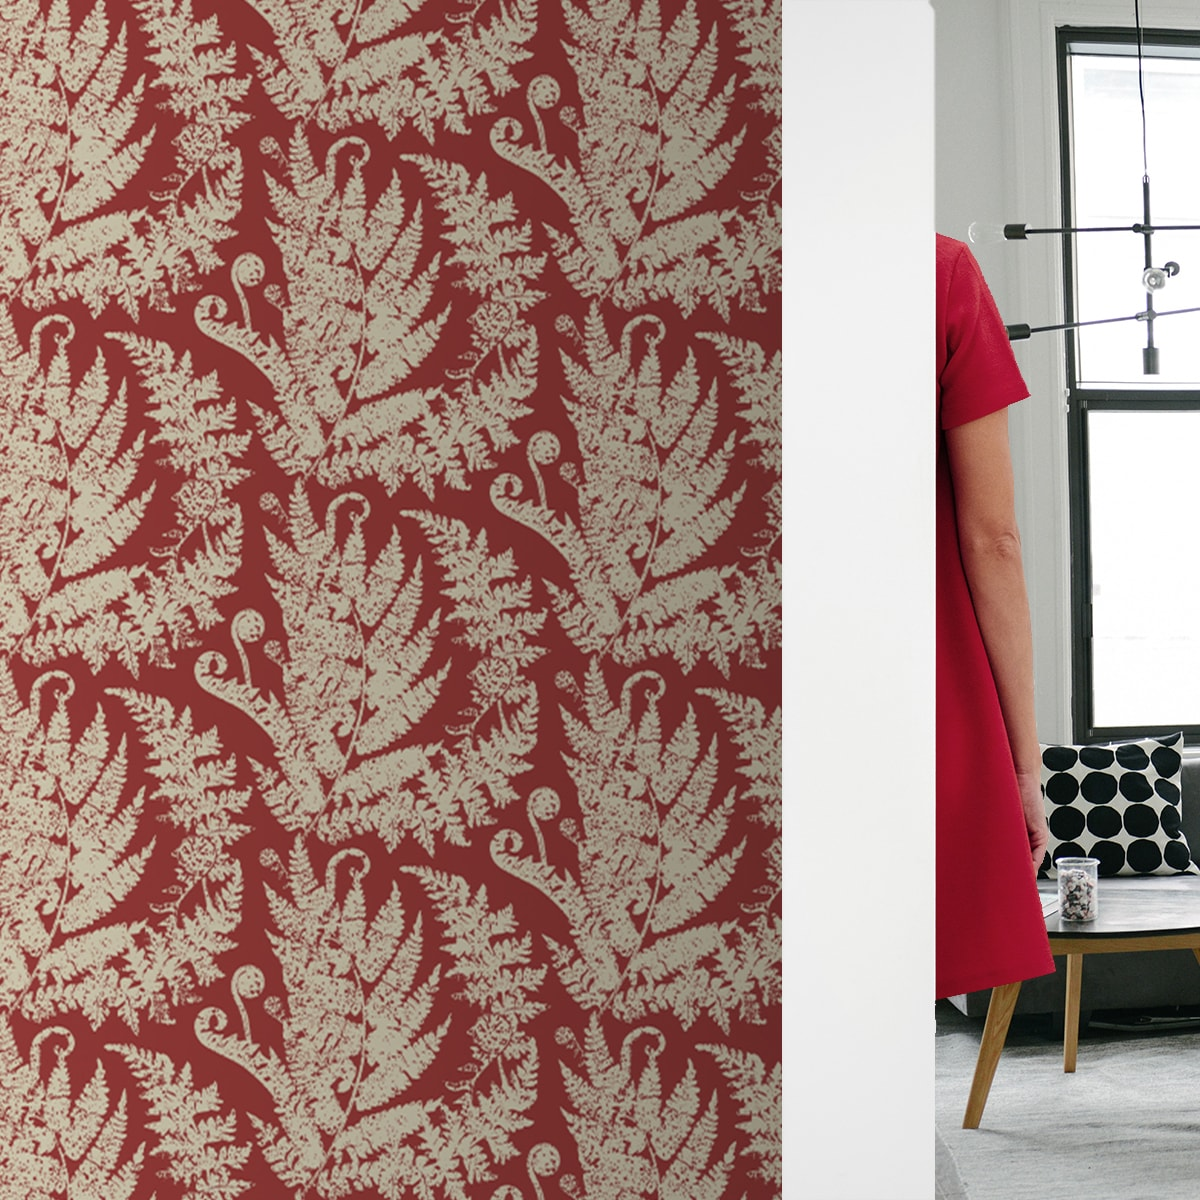 "Wandtapete rot: Florale Tapete ""Heidis Fernerie"" mit großem Farn Muster in Vliestapete Urwald"